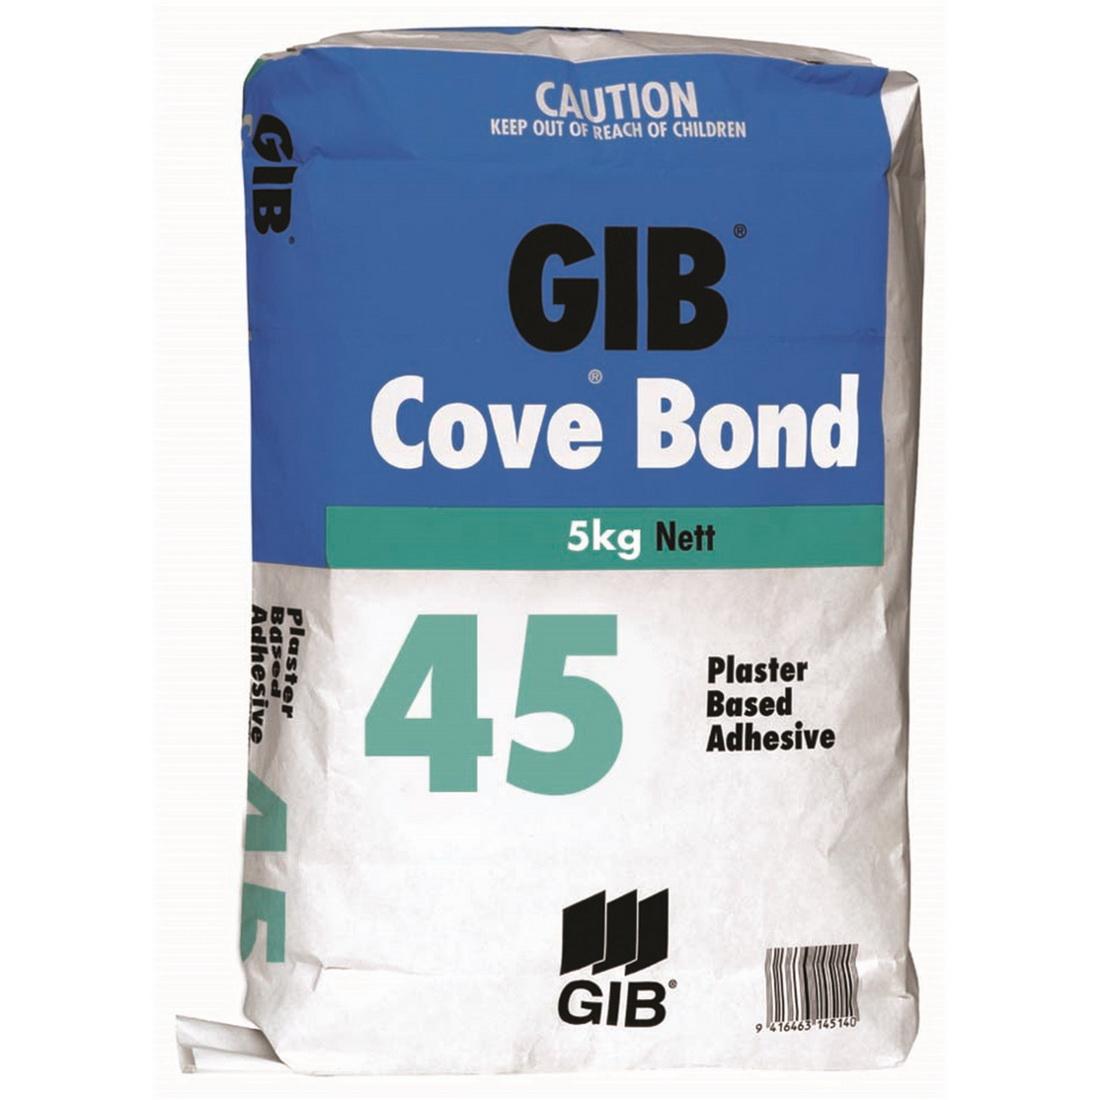 Cove Bond 5kg 90 Mins Setting Compound/Plaster Adhesive Off White